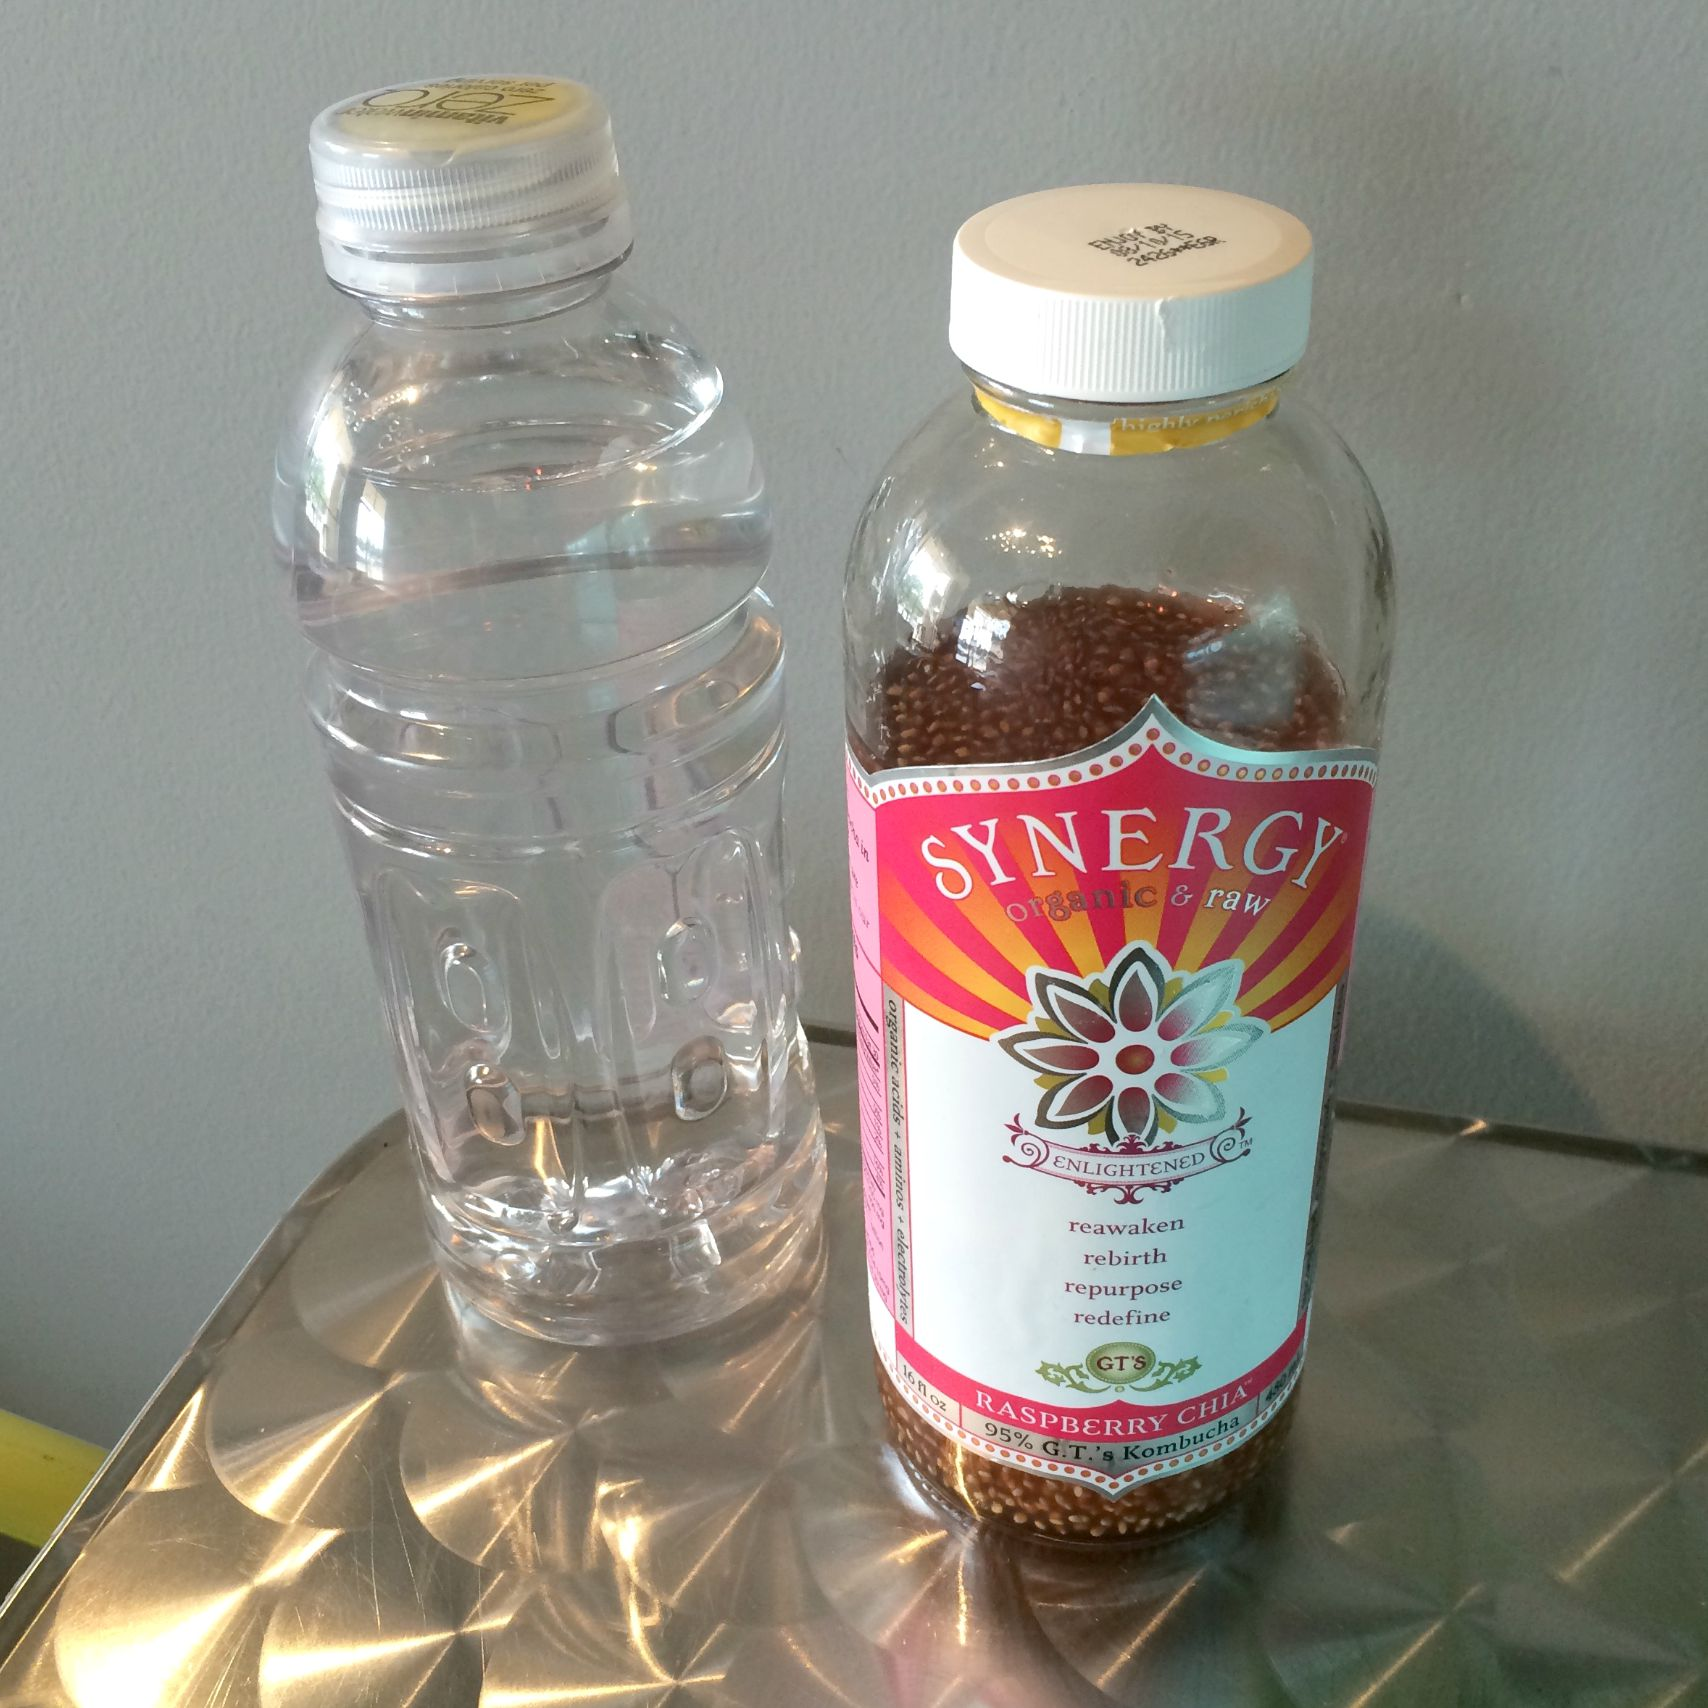 synergy raspberry chia kombucha